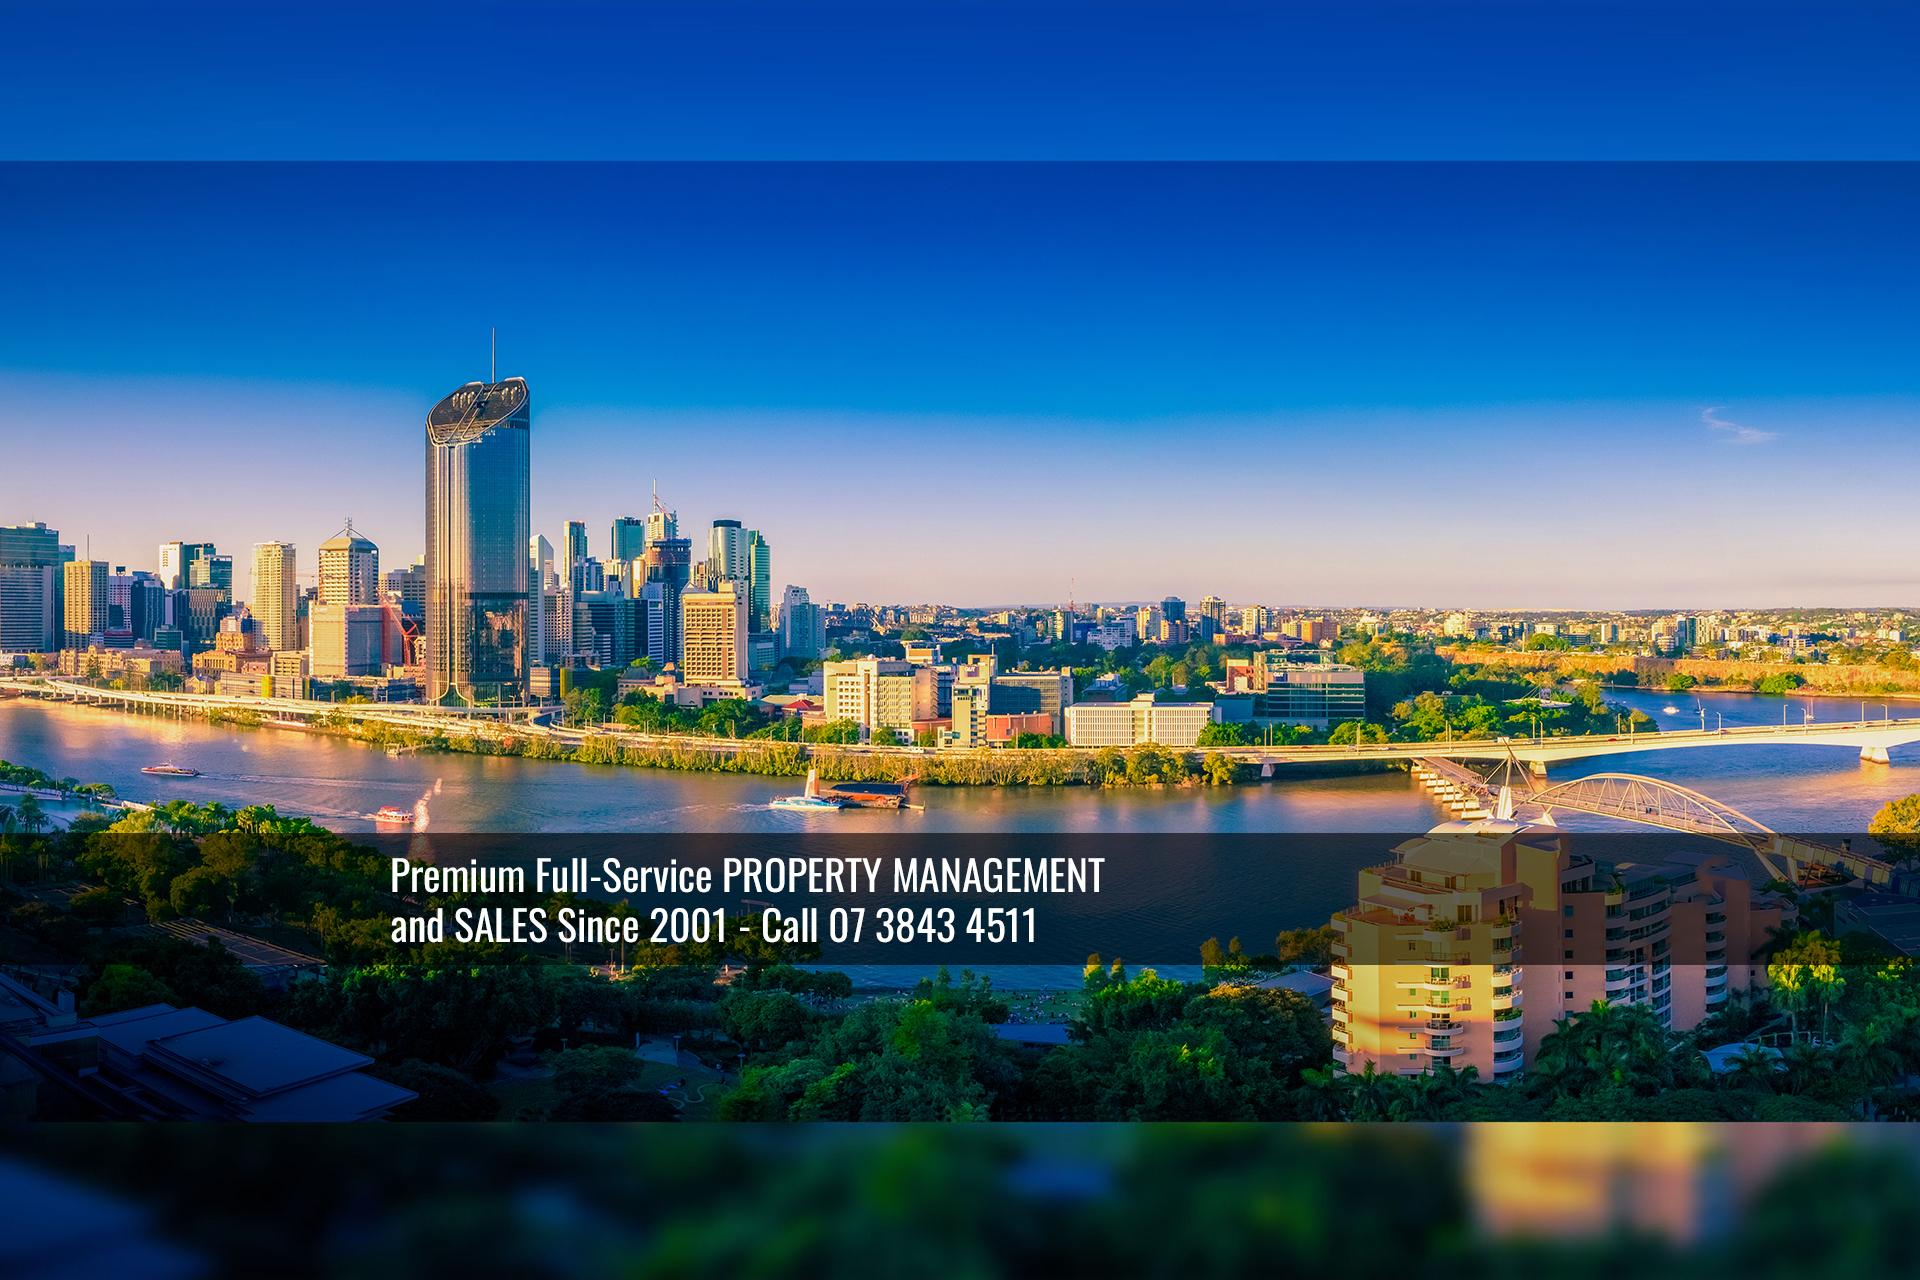 Premium Full Service Property Management Since 2001